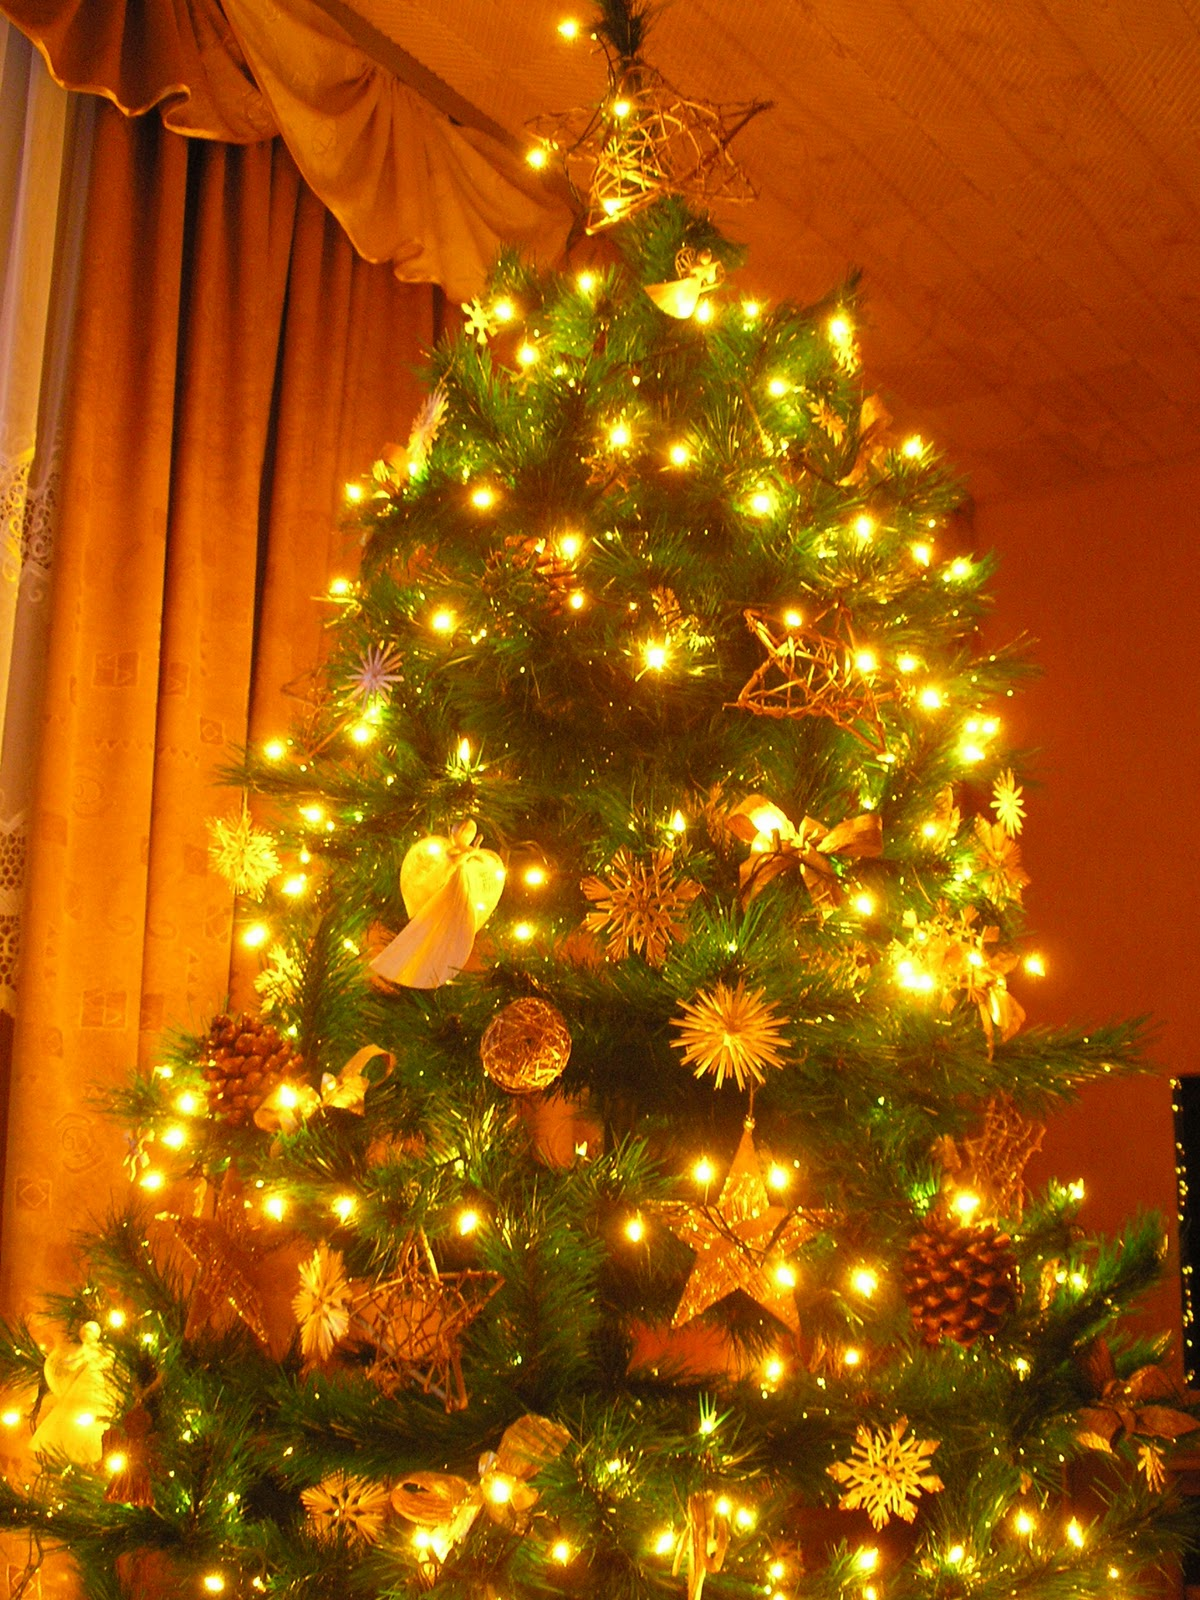 Kayo's Blog: My Christmas in Poland